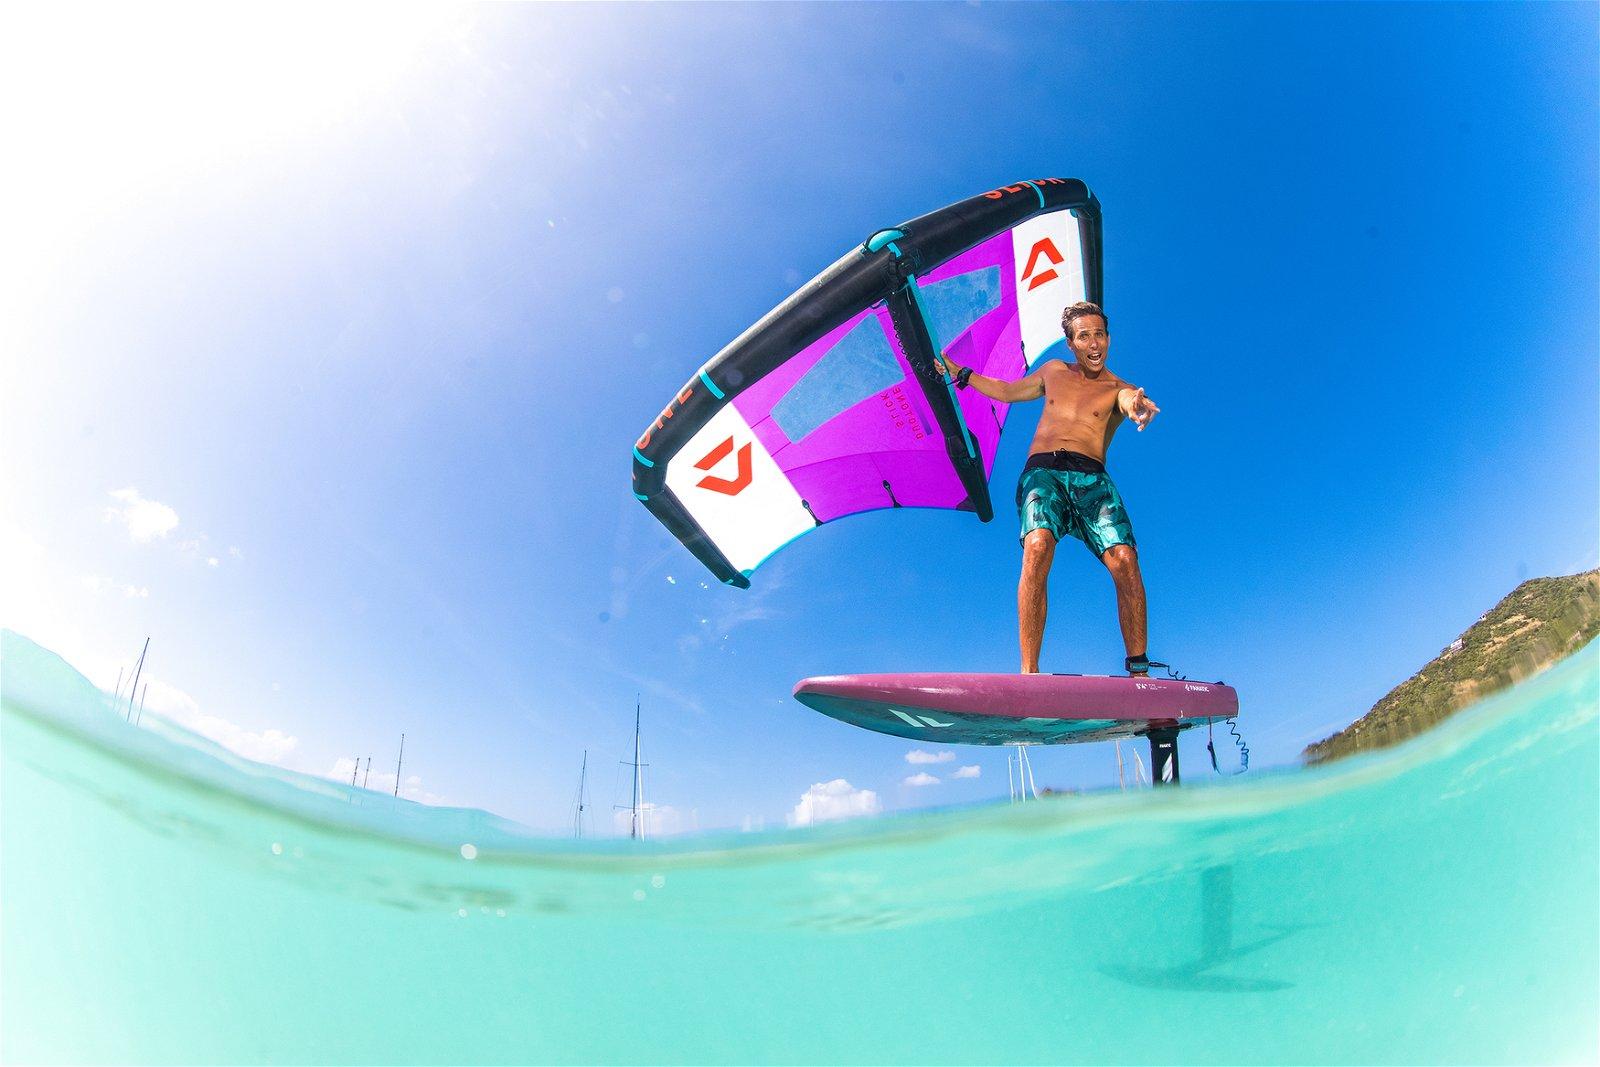 DTX21 FAX22 Slick SkyWing JeremieTronet by TobyBromwich-9775